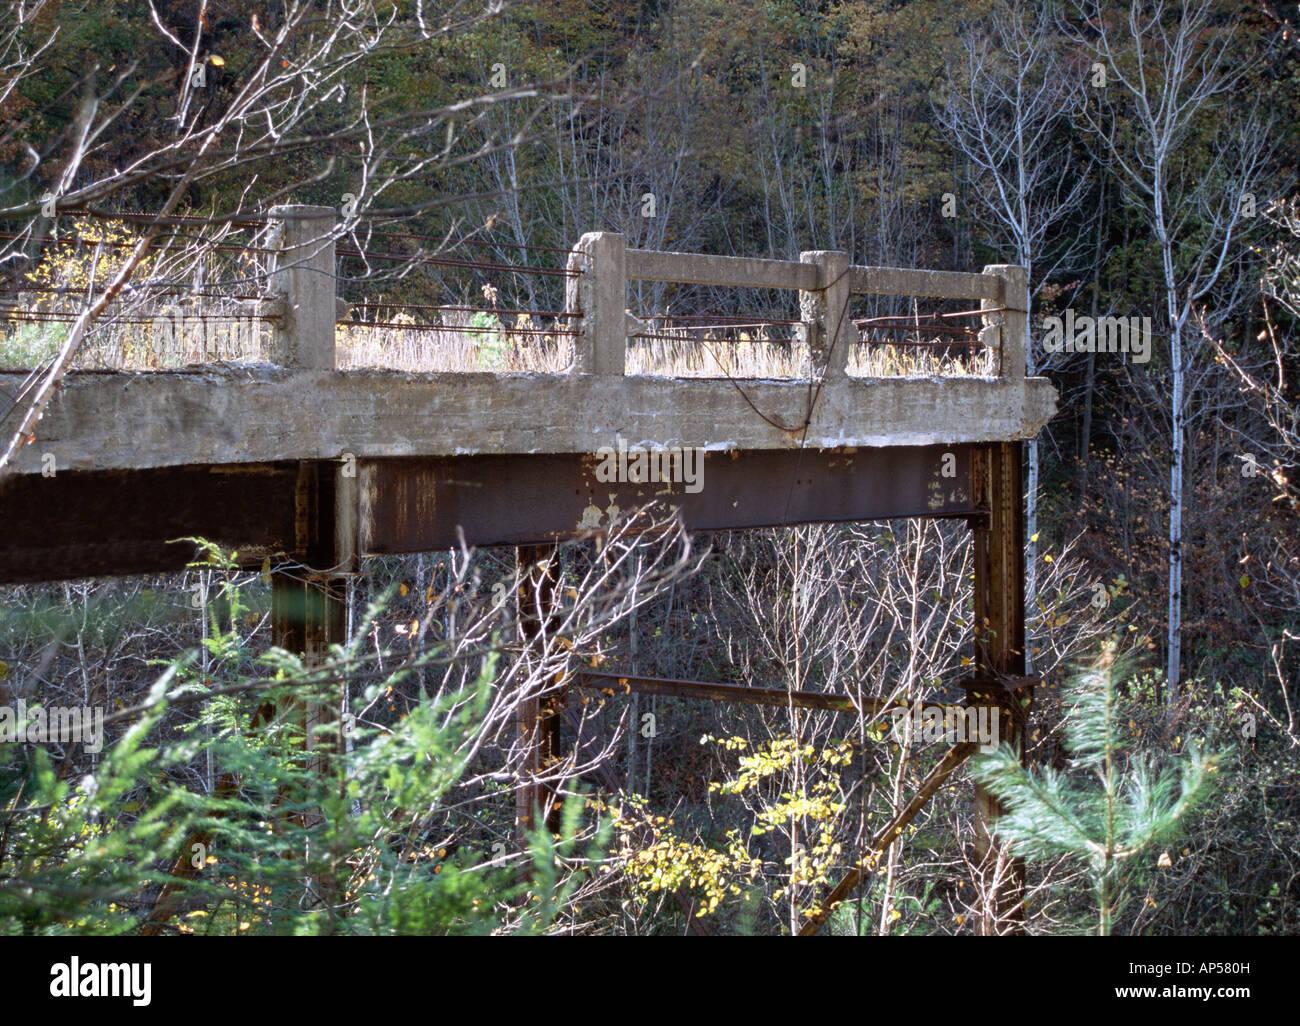 Bridge to Nowhere Immagini Stock